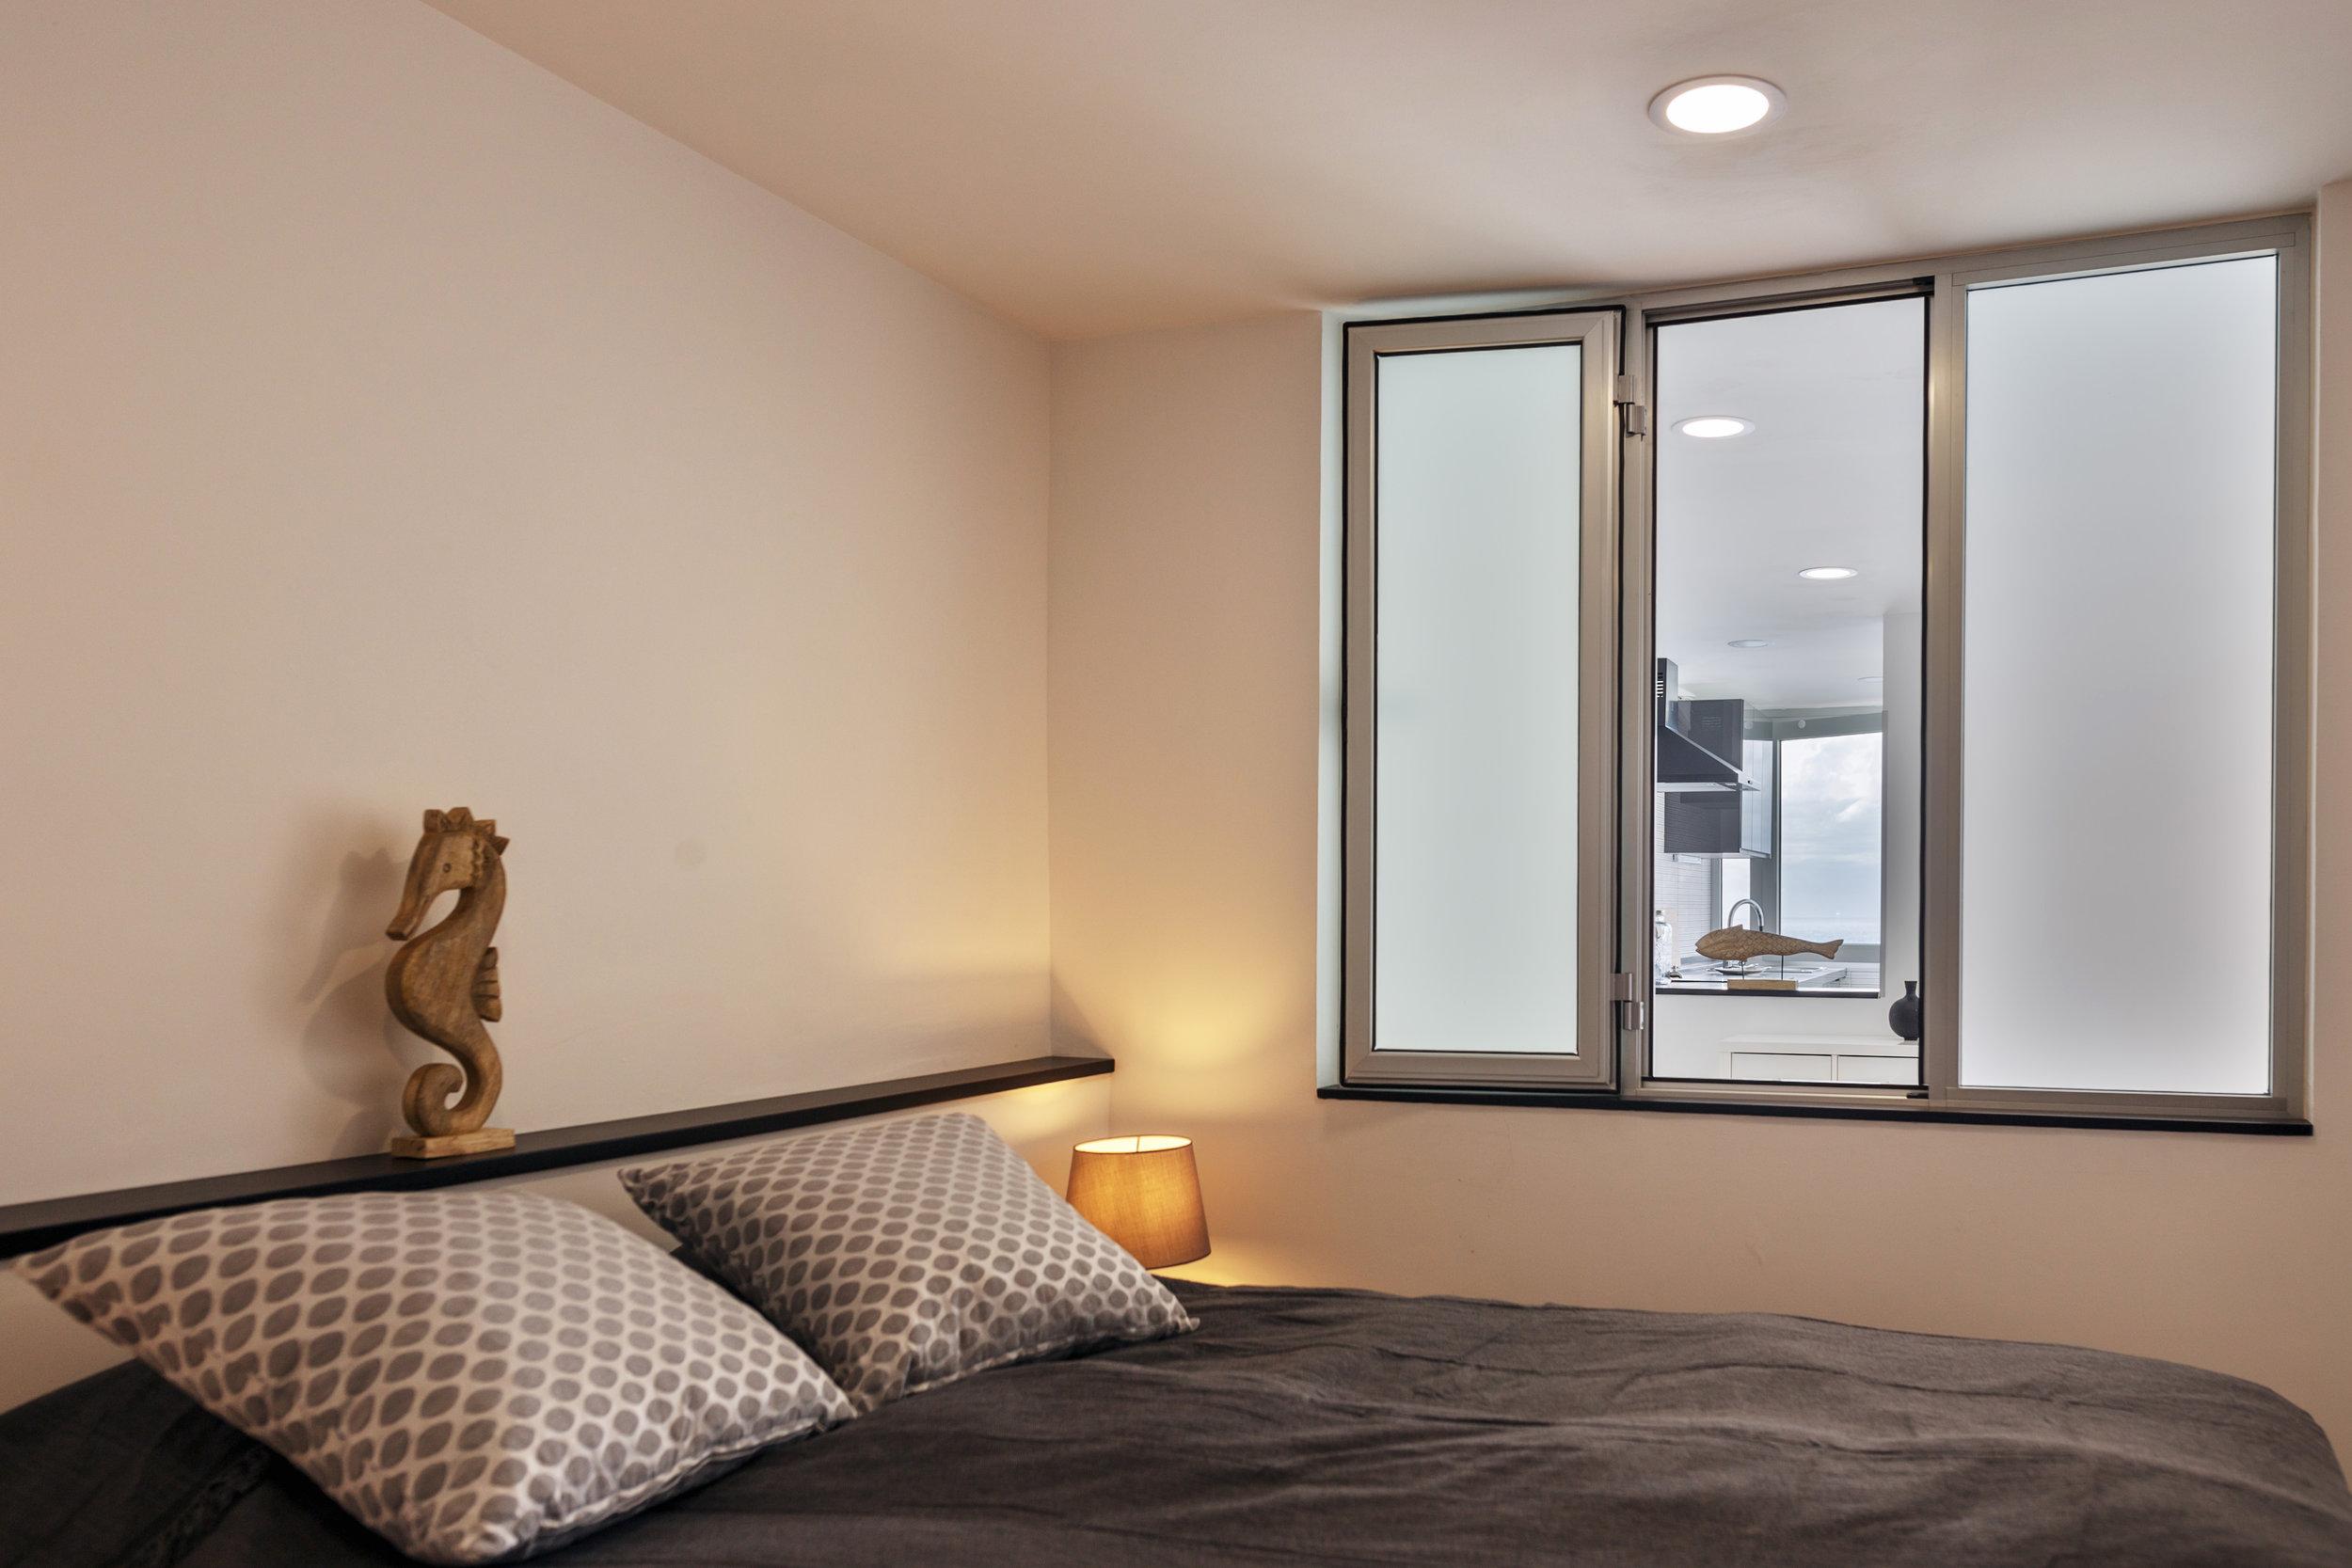 Lavagalerie Schlafzimmer 4 HDR.jpg